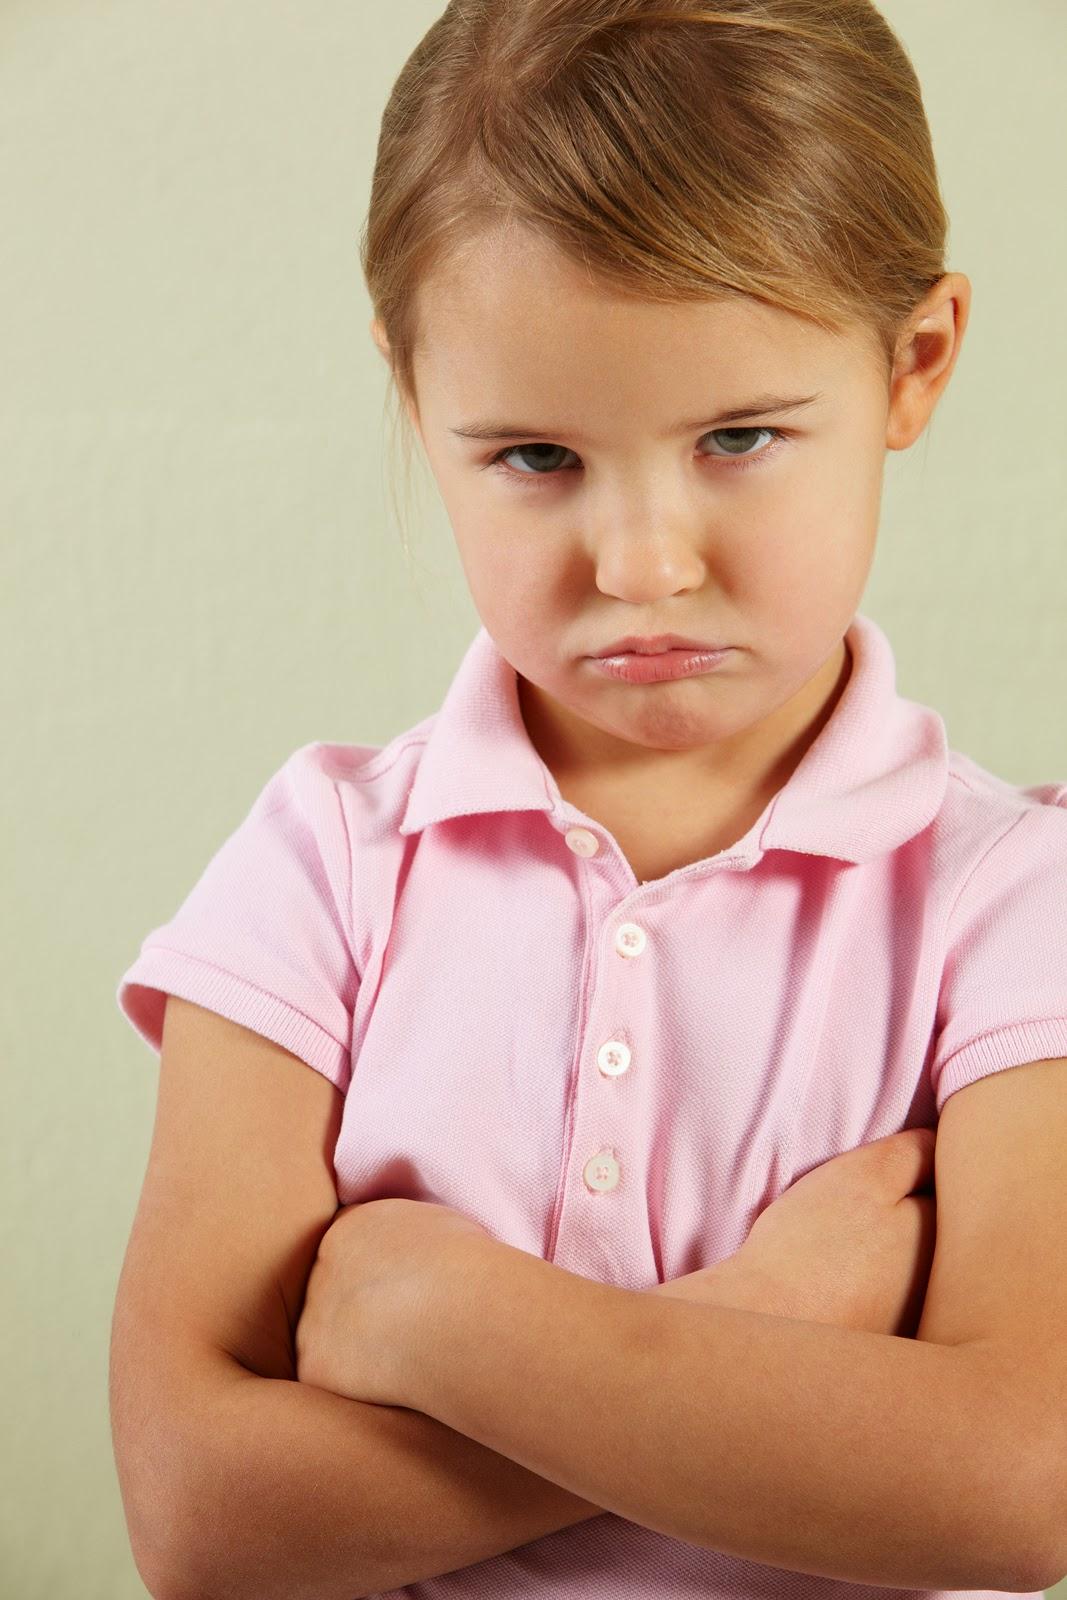 angry child - photo #12